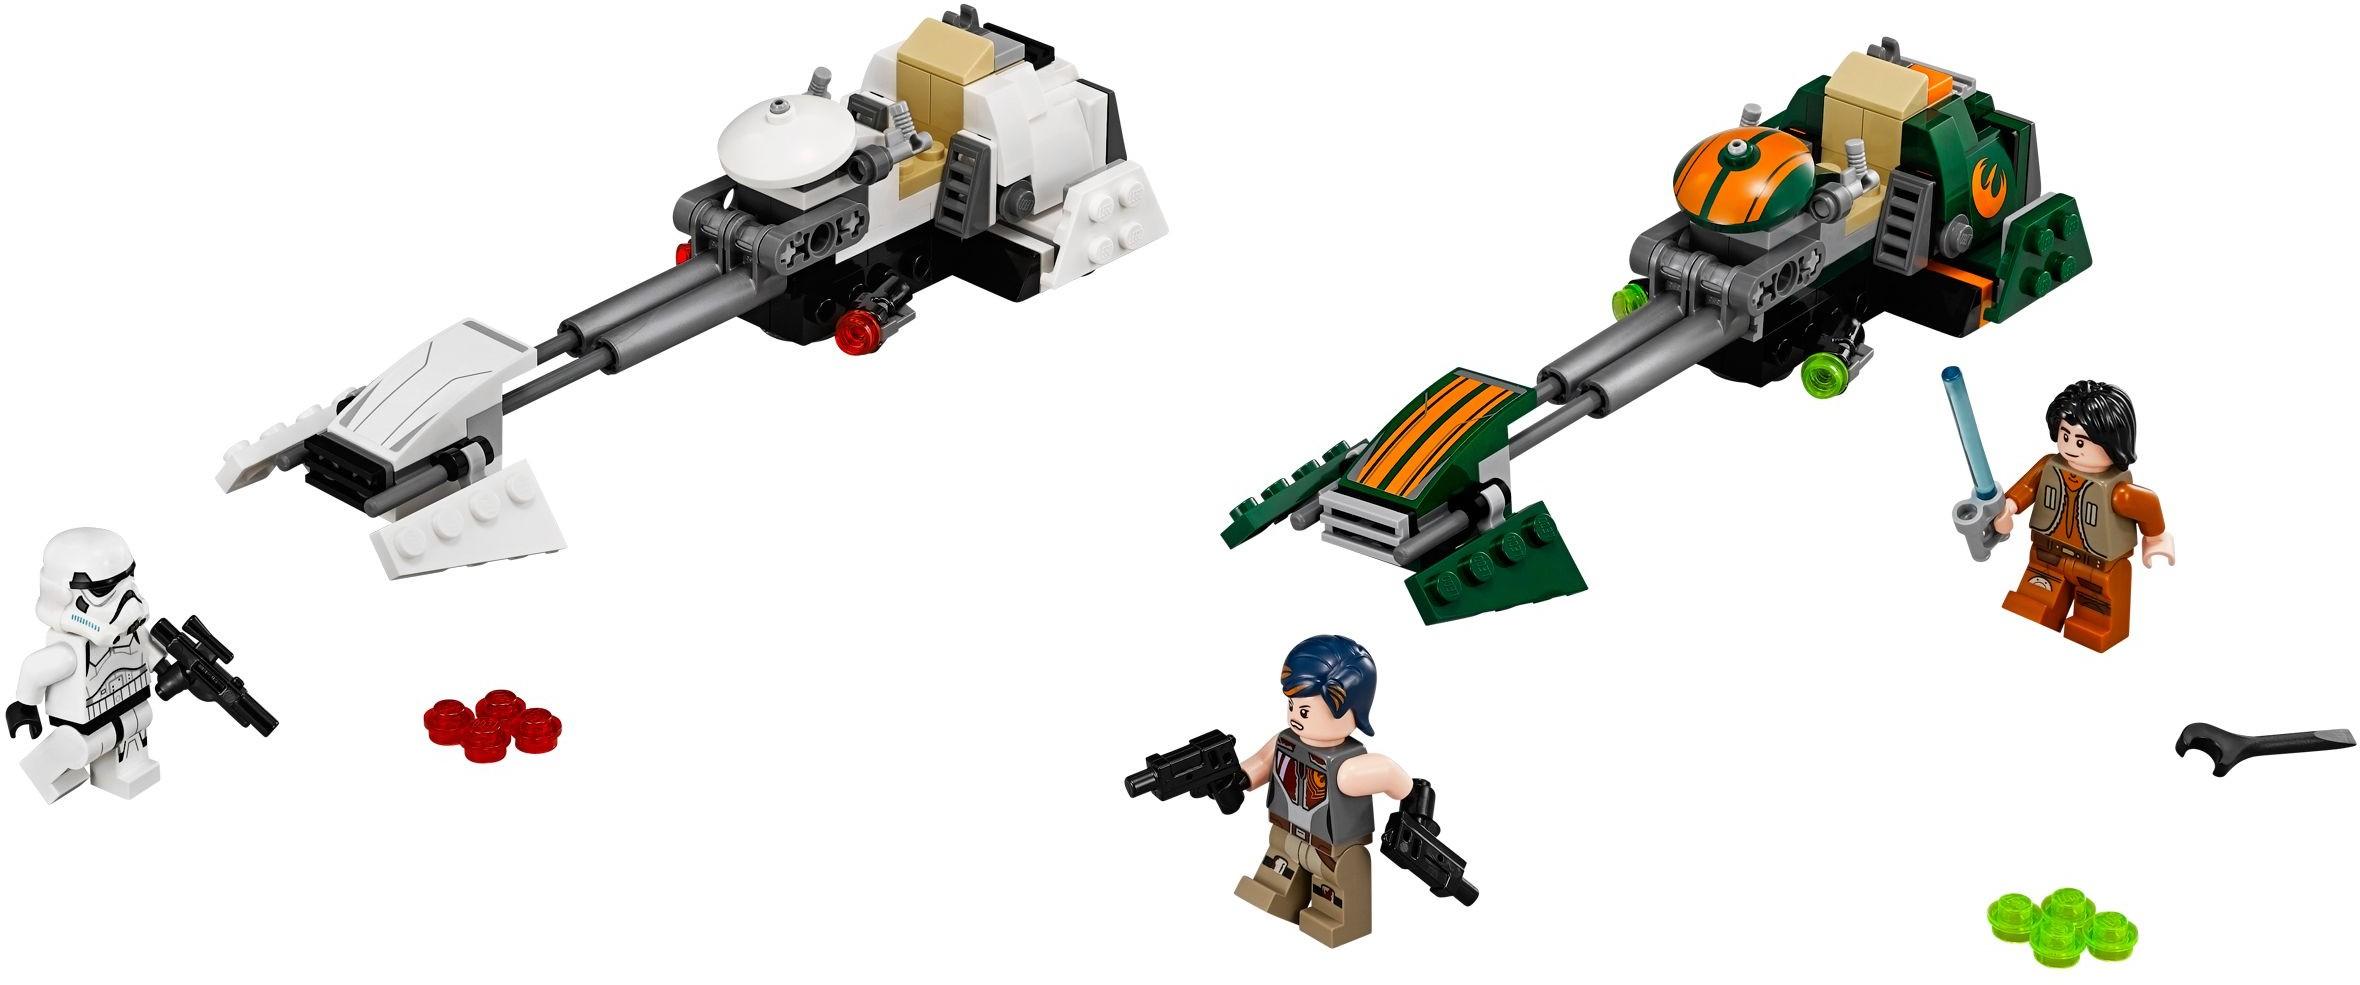 Tagged Stormtrooper Brickset Lego Set Guide And Database